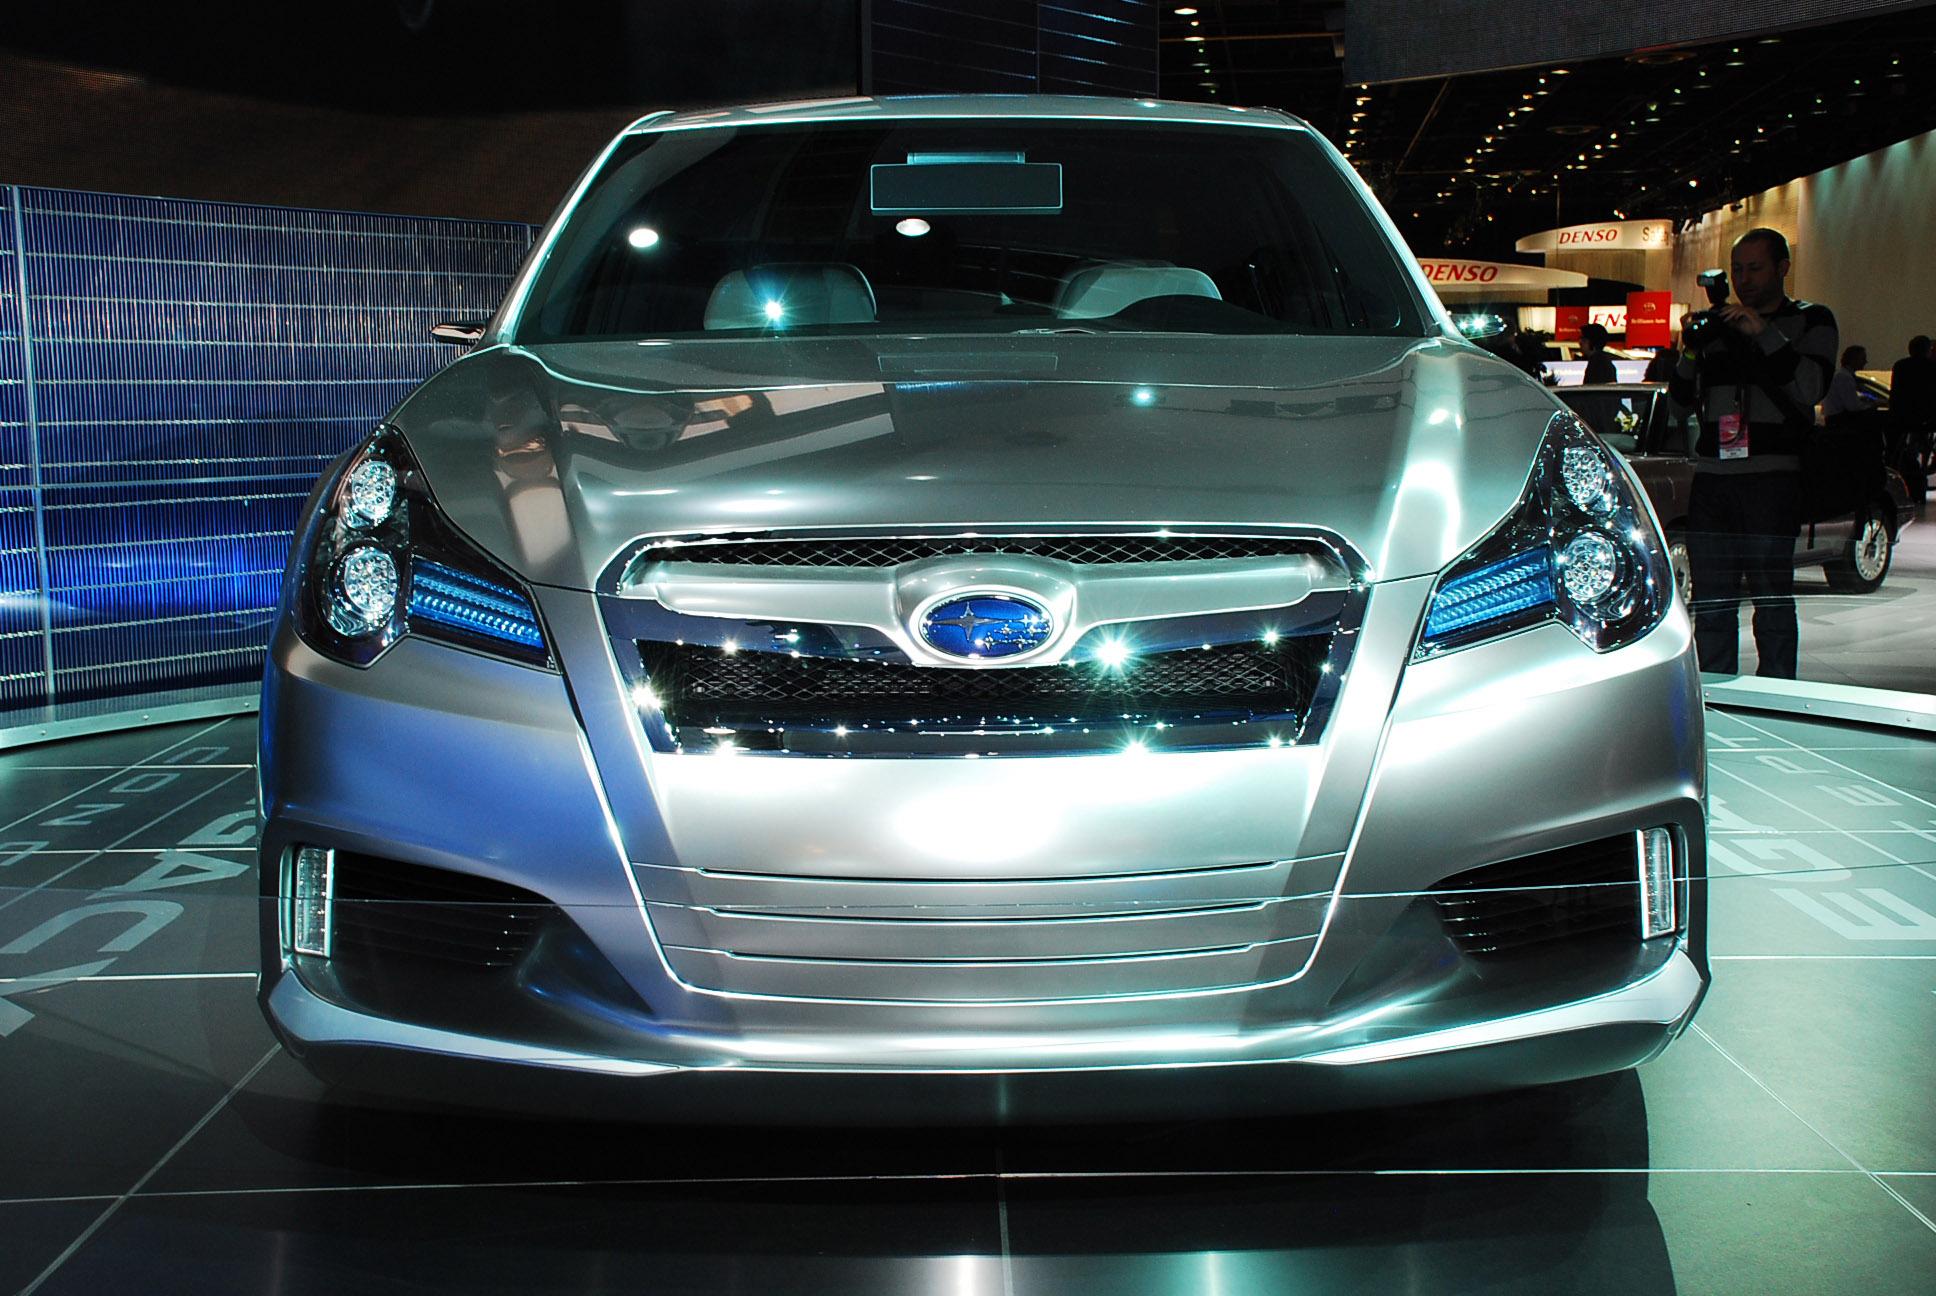 Subaru legacy concept detroit 2009 picture 48030 subaru legacy concept detroit vanachro Image collections